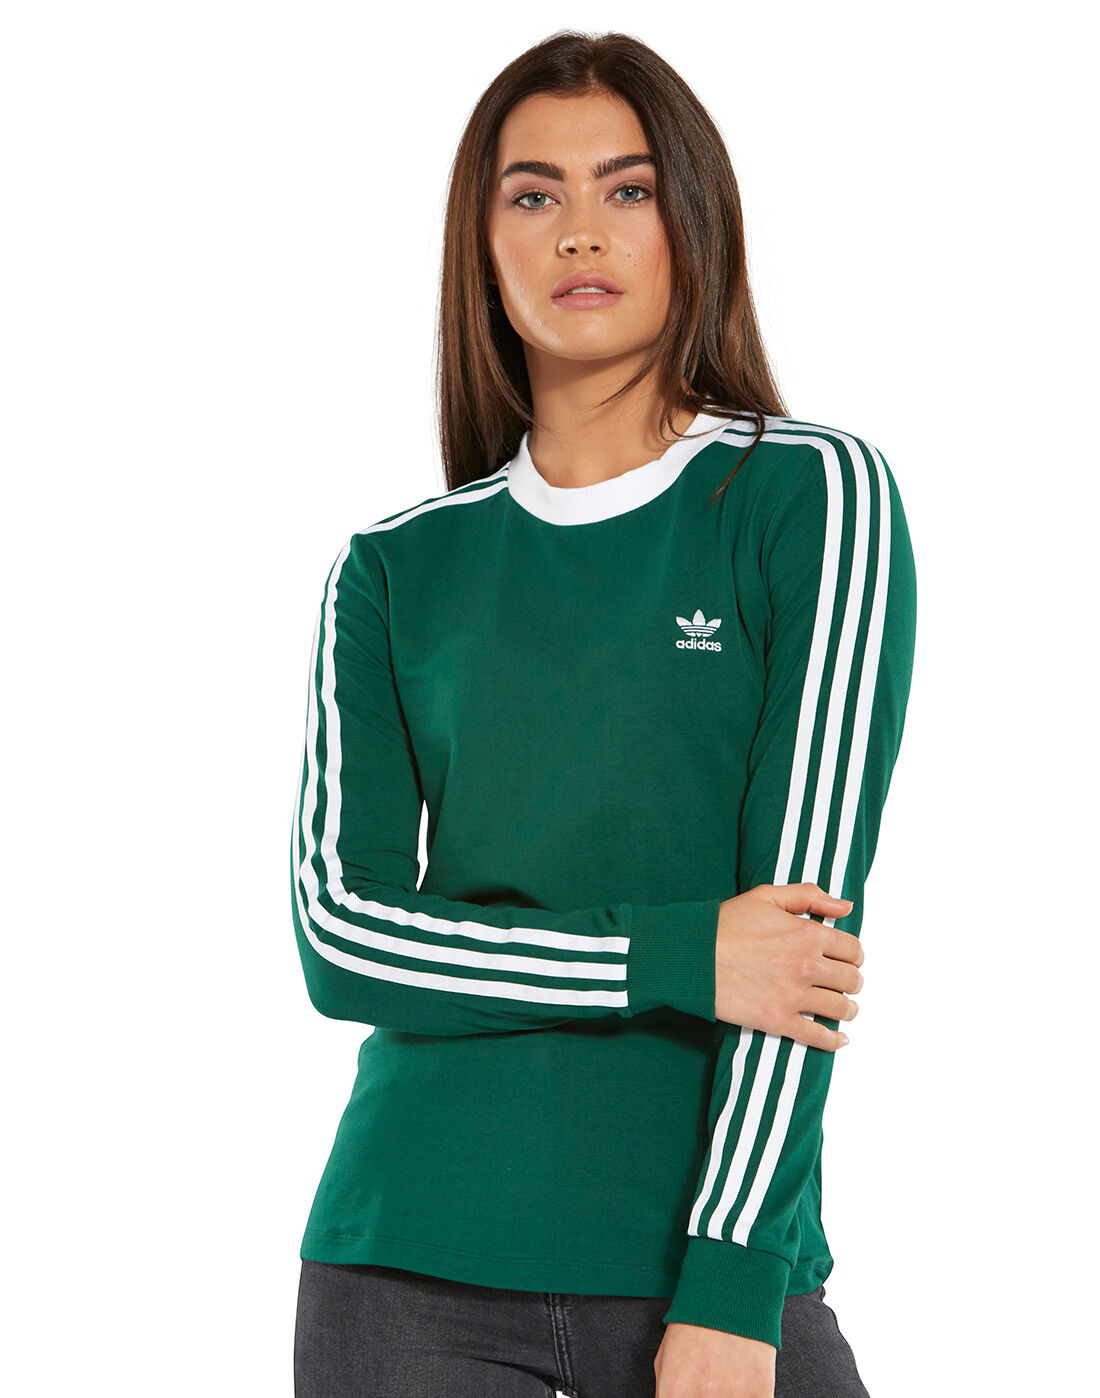 Women's Green adidas Originals Long Sleeve Top | Life Style